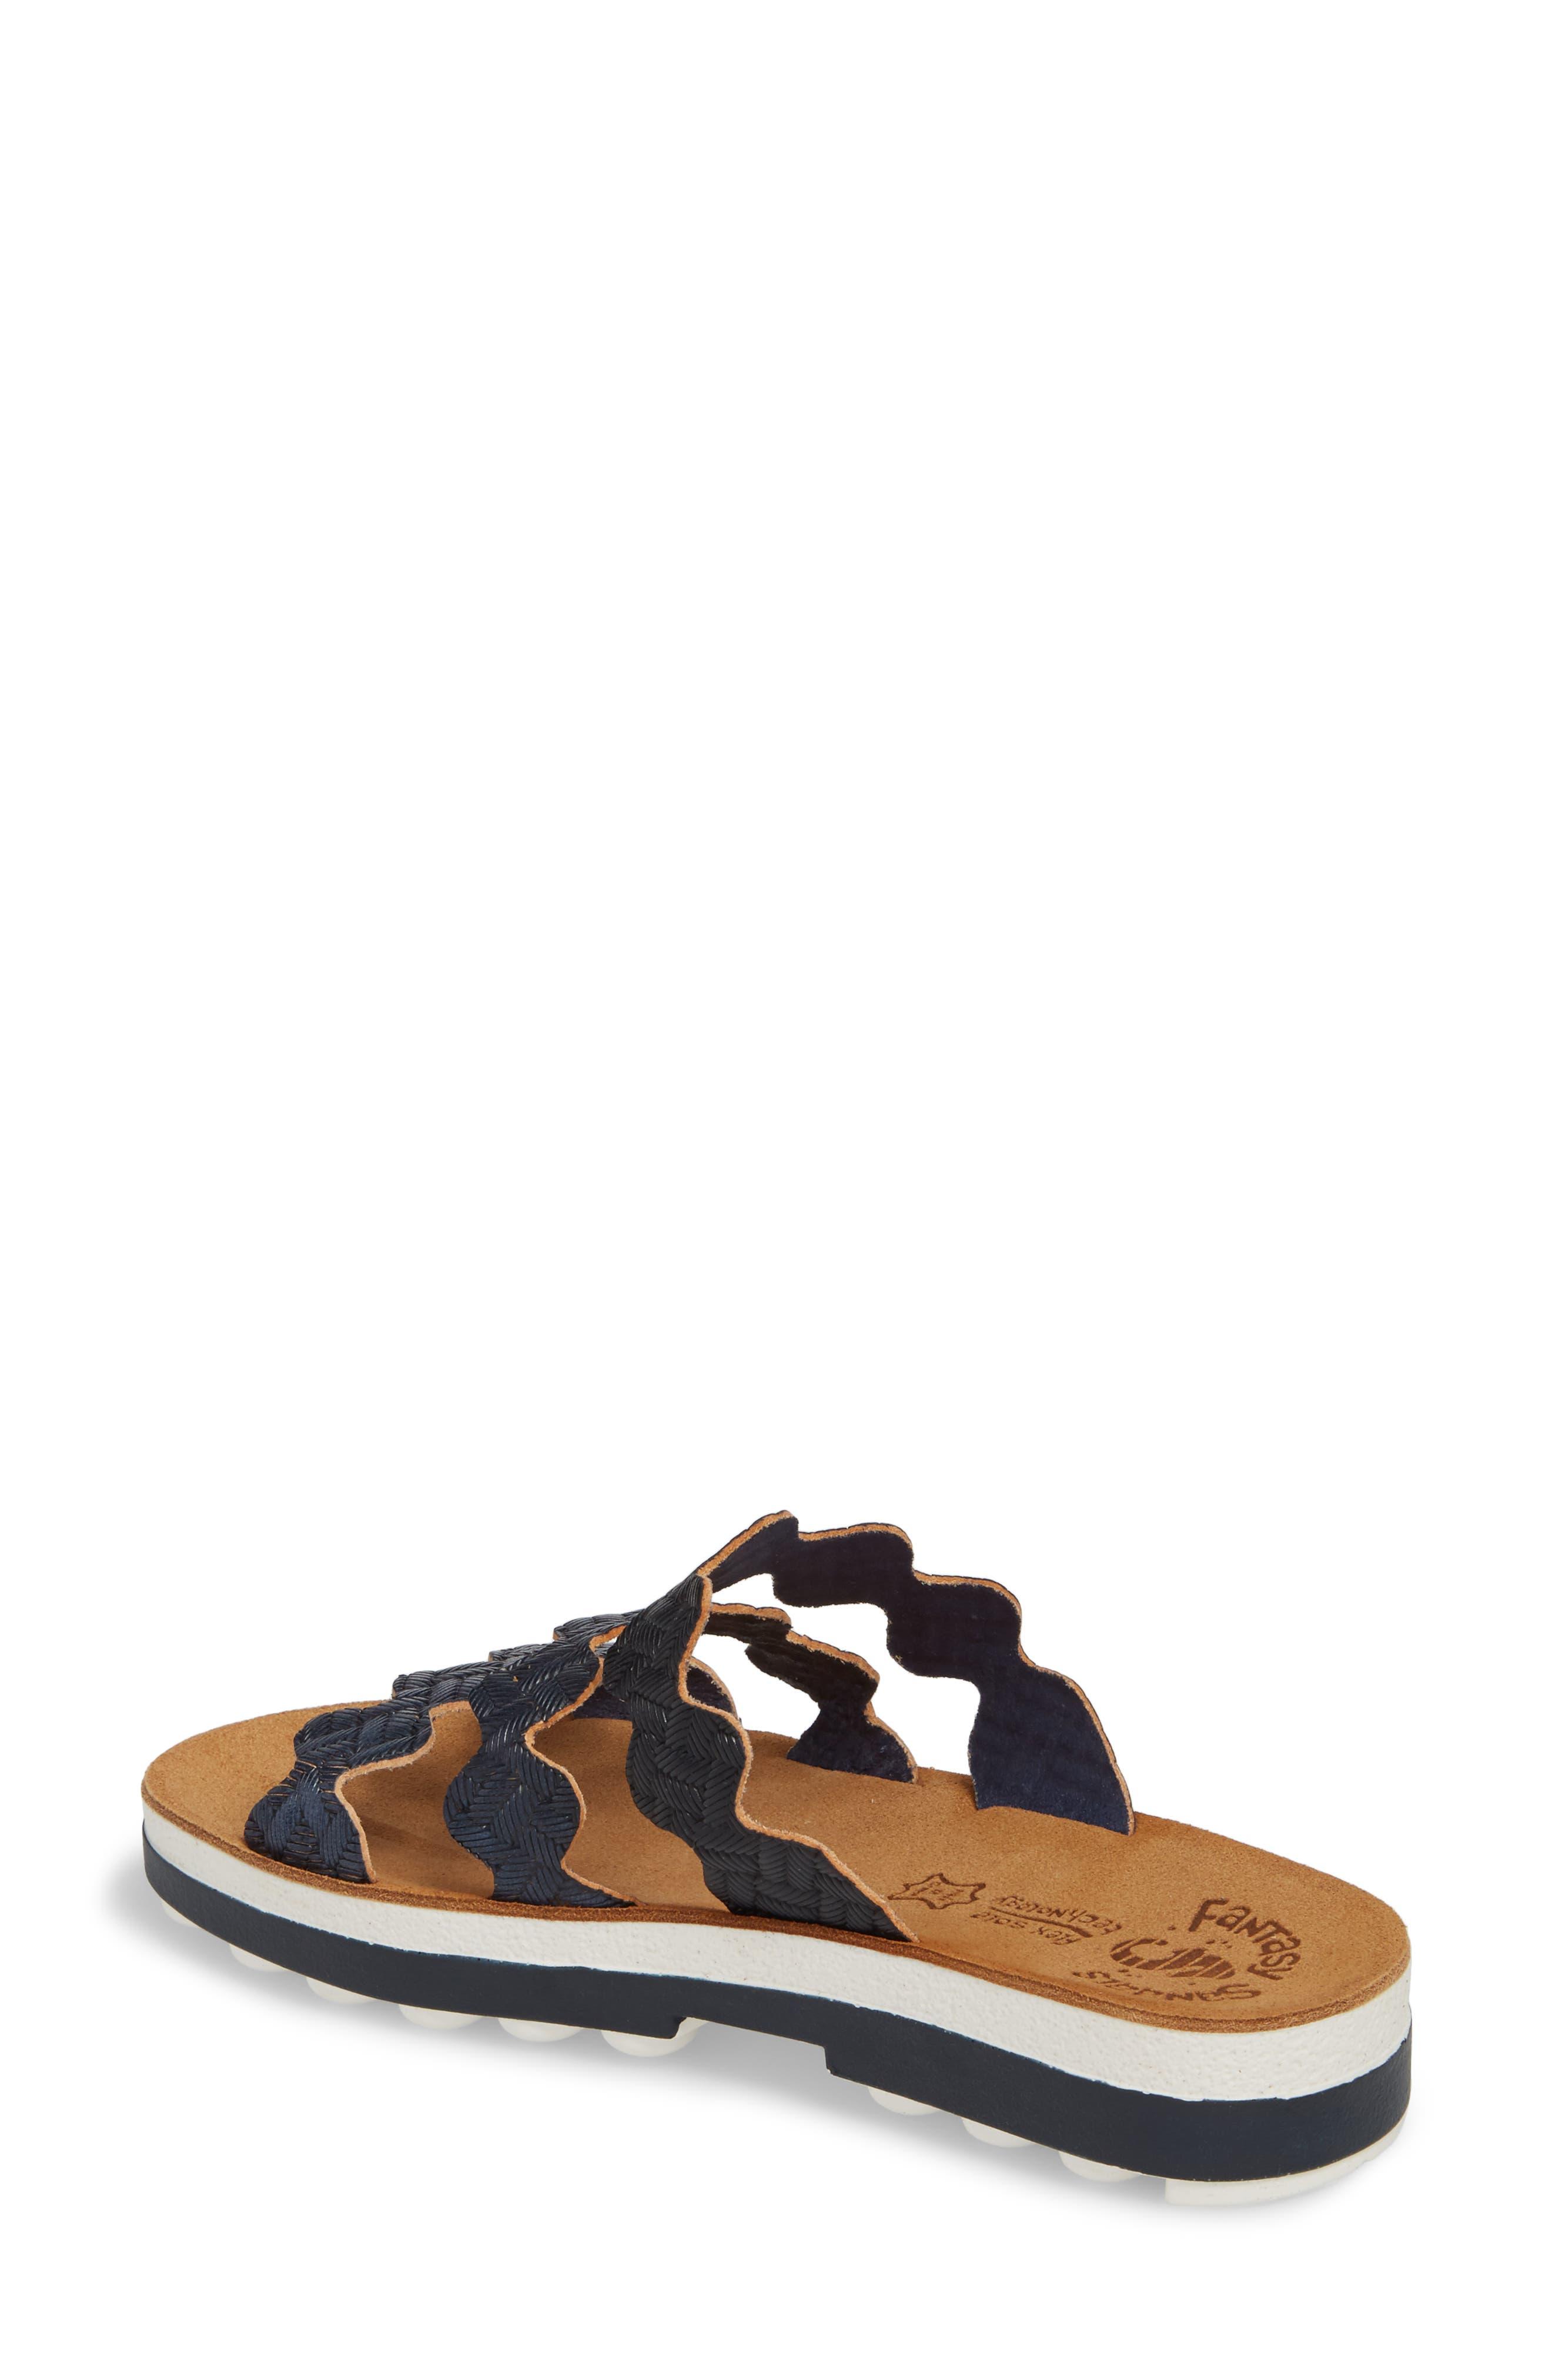 Alternate Image 2  - Fantasy Sandals Waves Slide Sandal (Women)